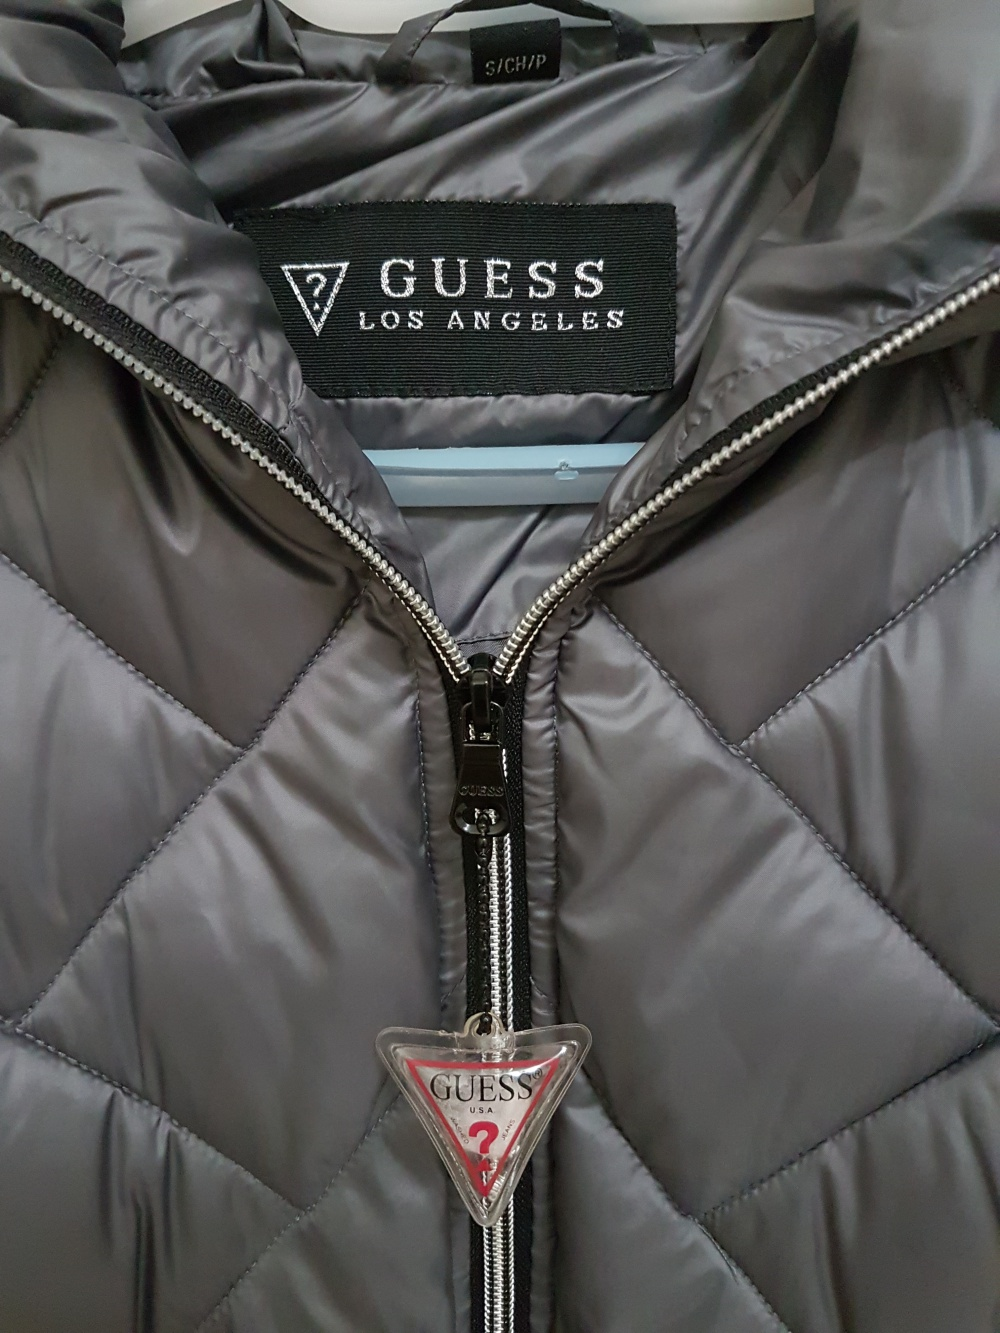 Guess утепленная куртка - пуффер, размер S (42-44)